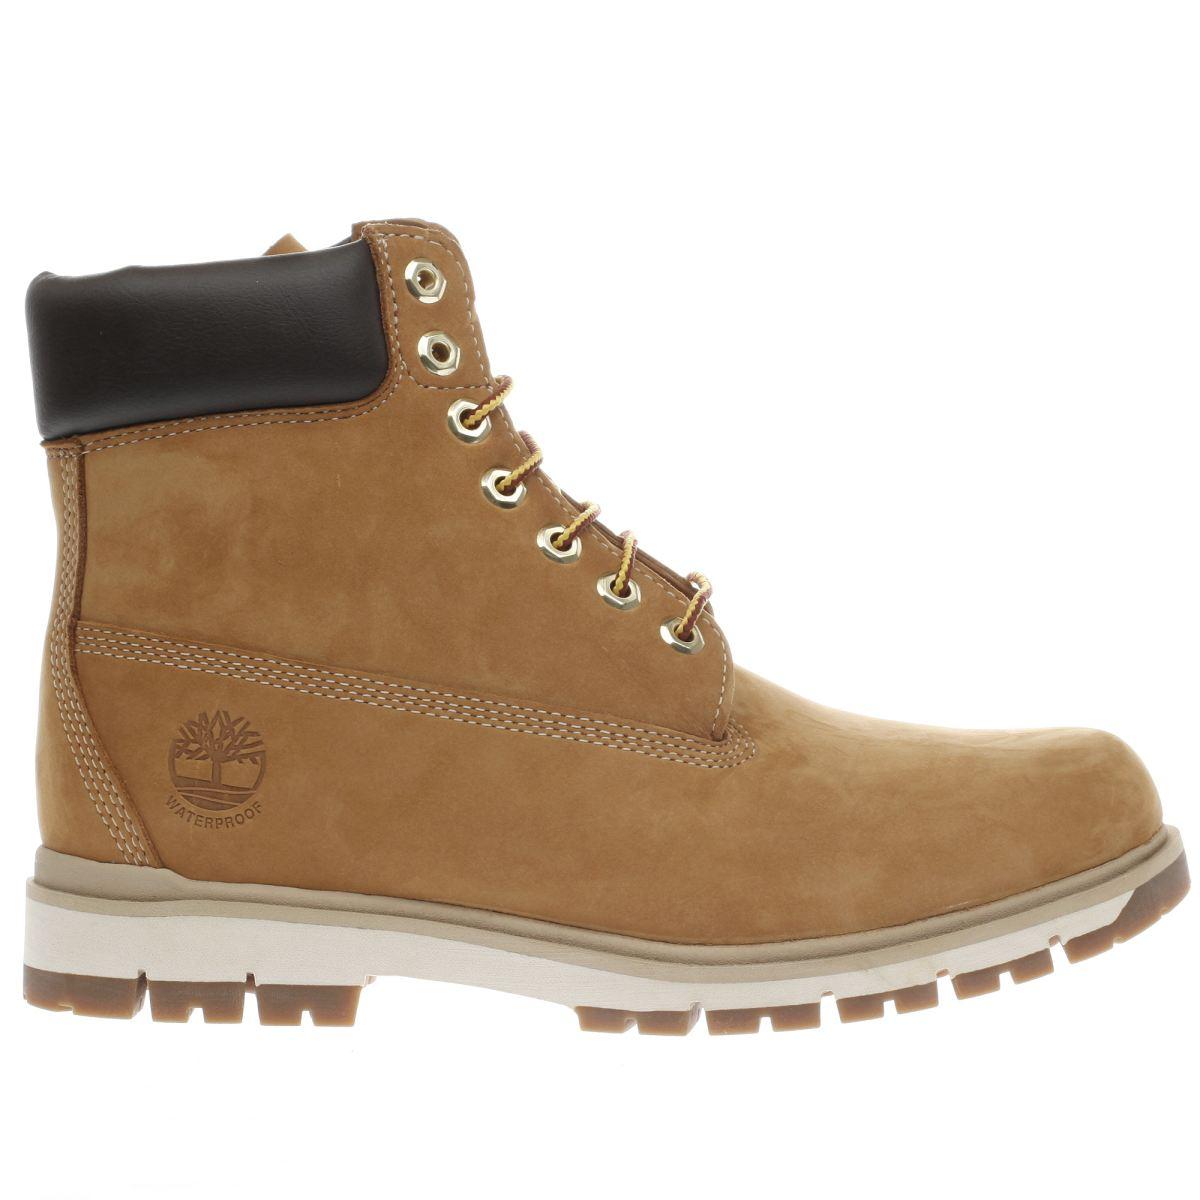 timberland tan radford 6 inch boots